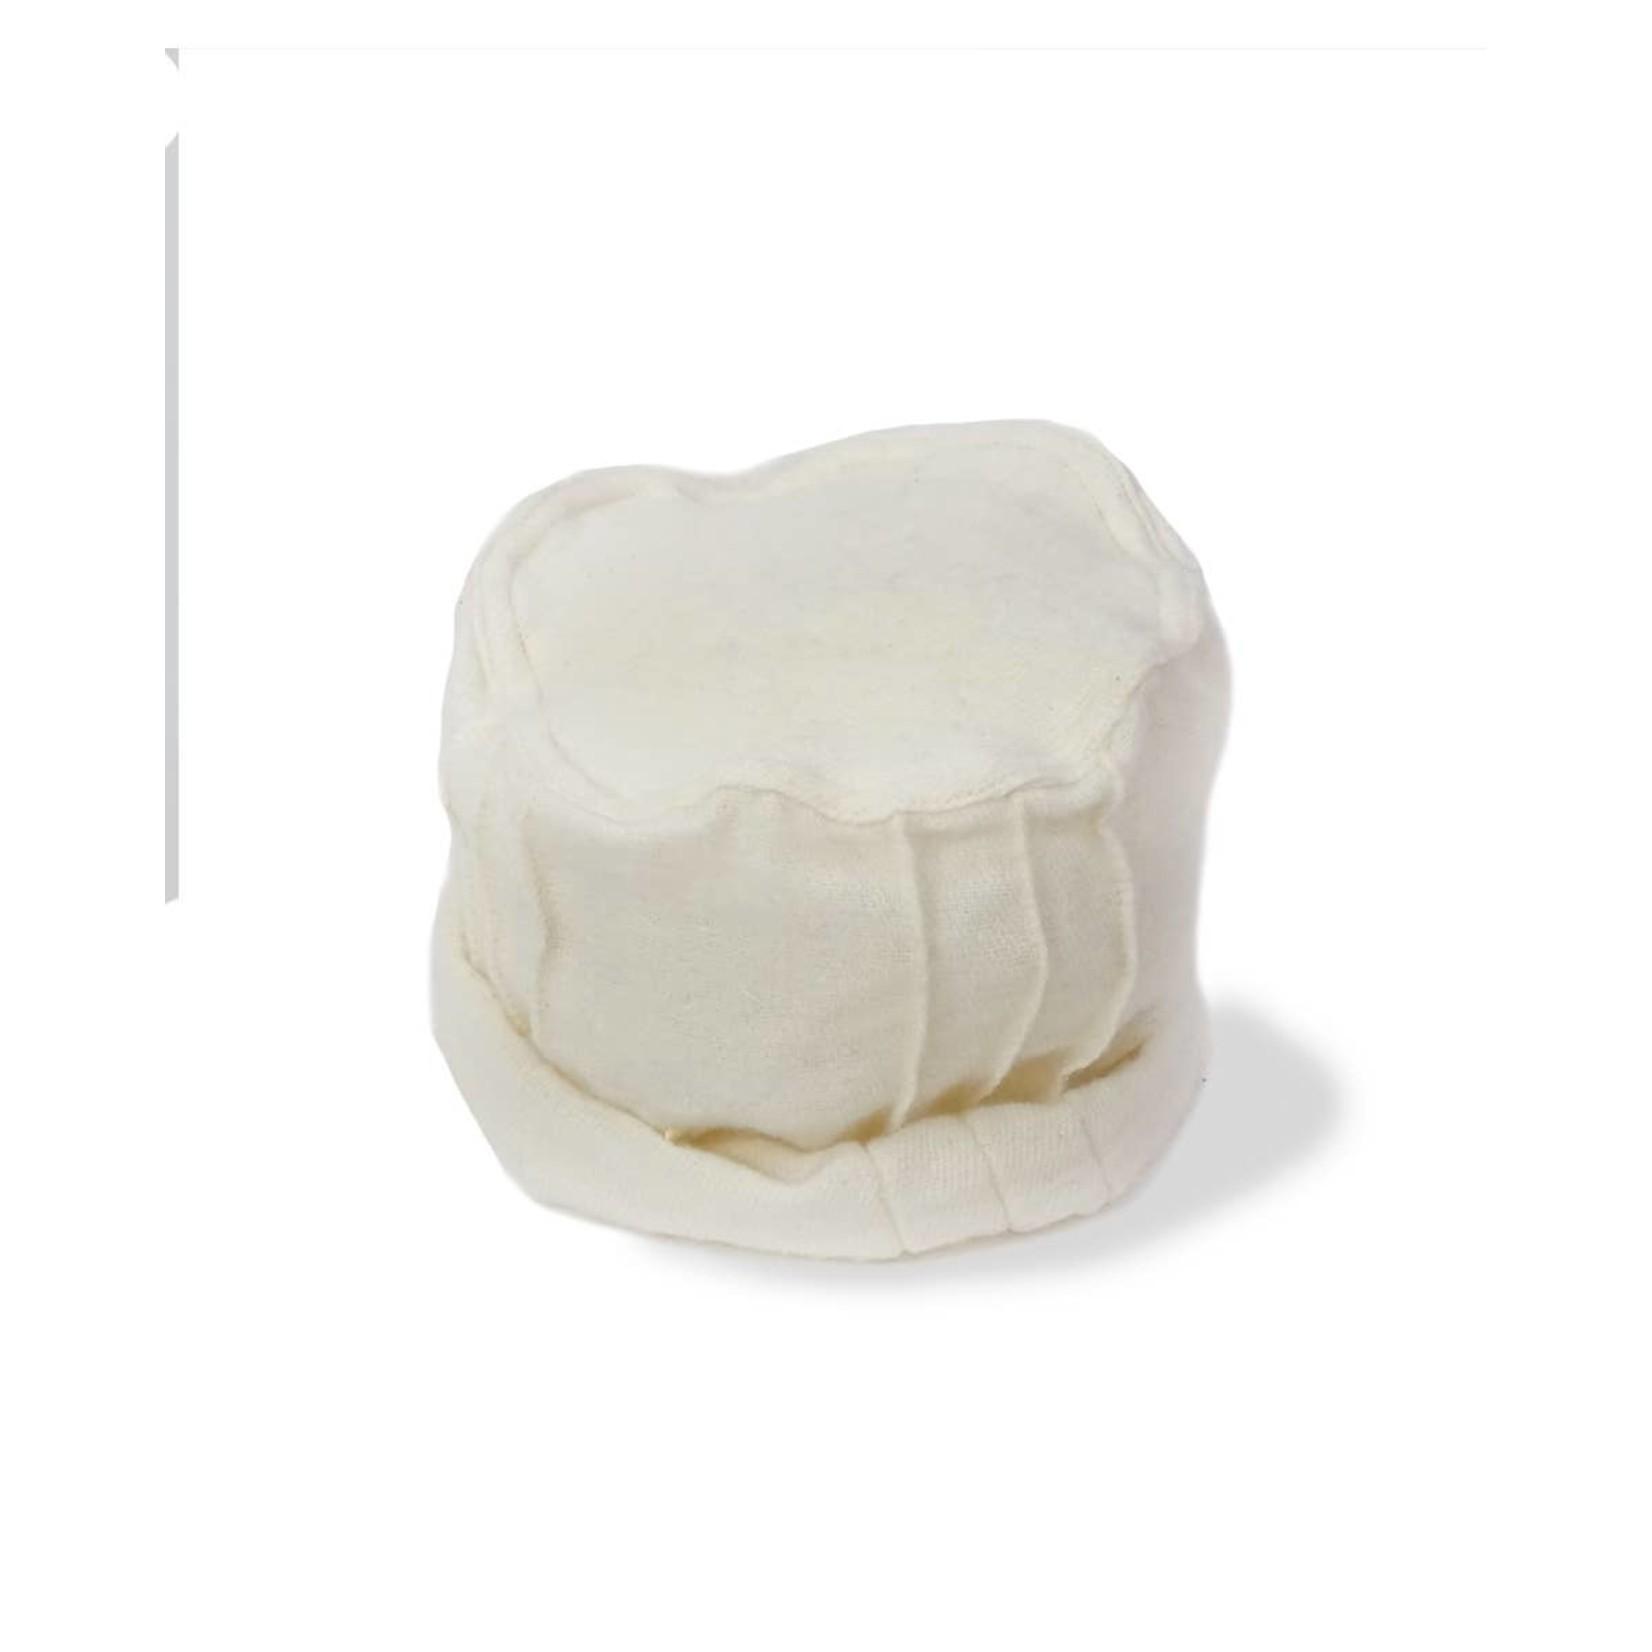 Zig Zag Asian Brushed Woven Pashtun Hat in White